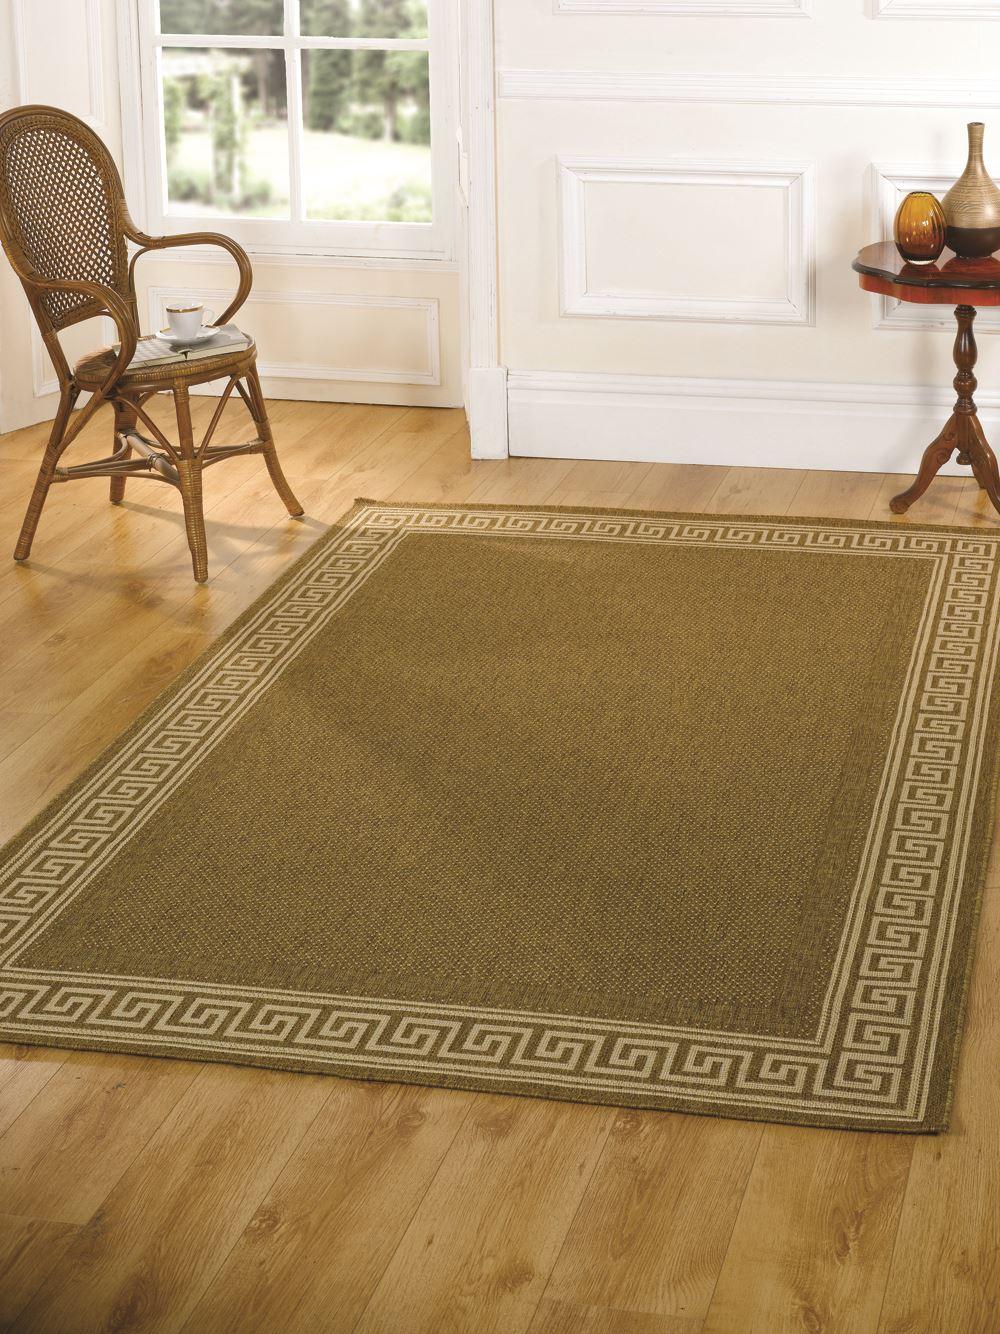 Florence carpet and tile carpet vidalondon flair rugs florence rug conservatory bright flat weave baanklon Choice Image